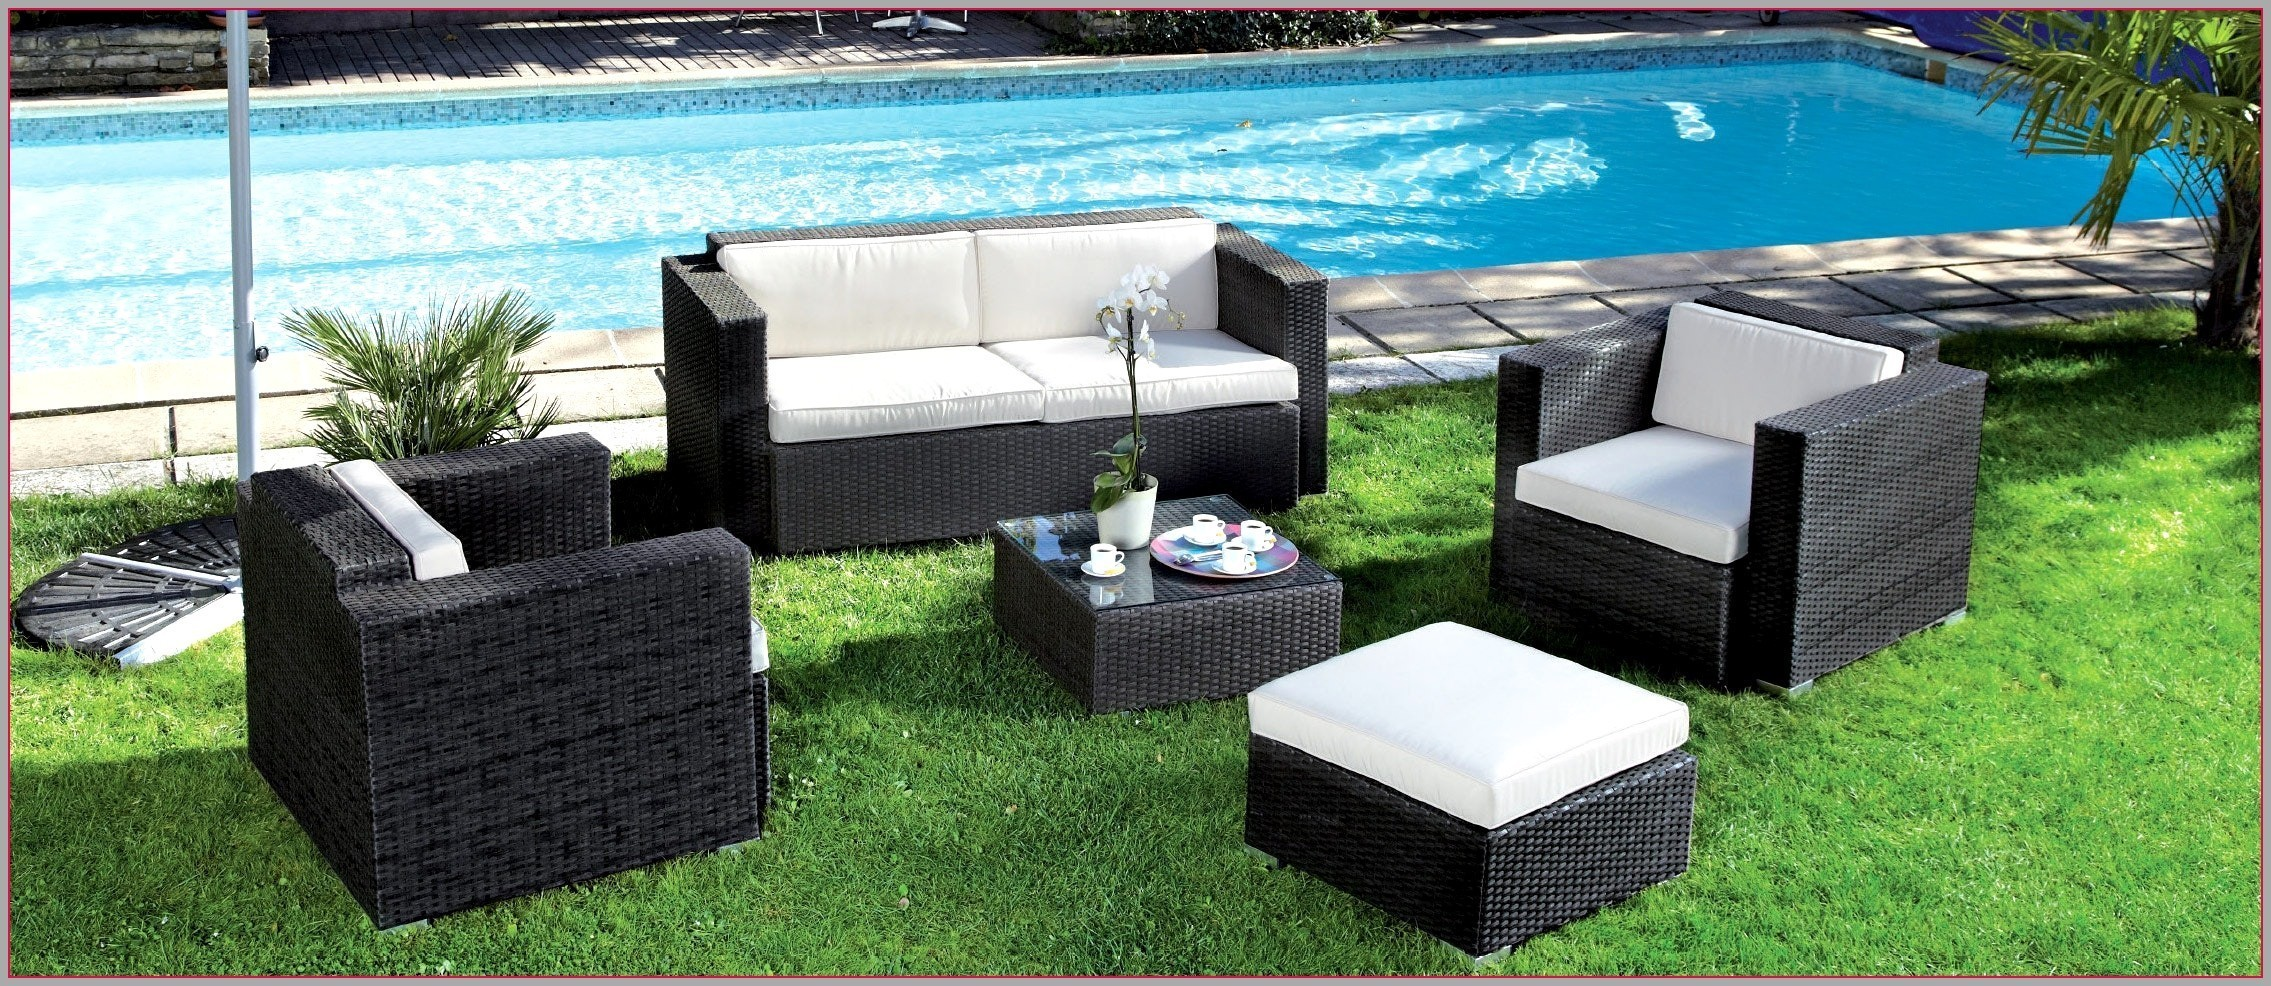 Chaise pliante de jardin super u - veranda-styledevie.fr